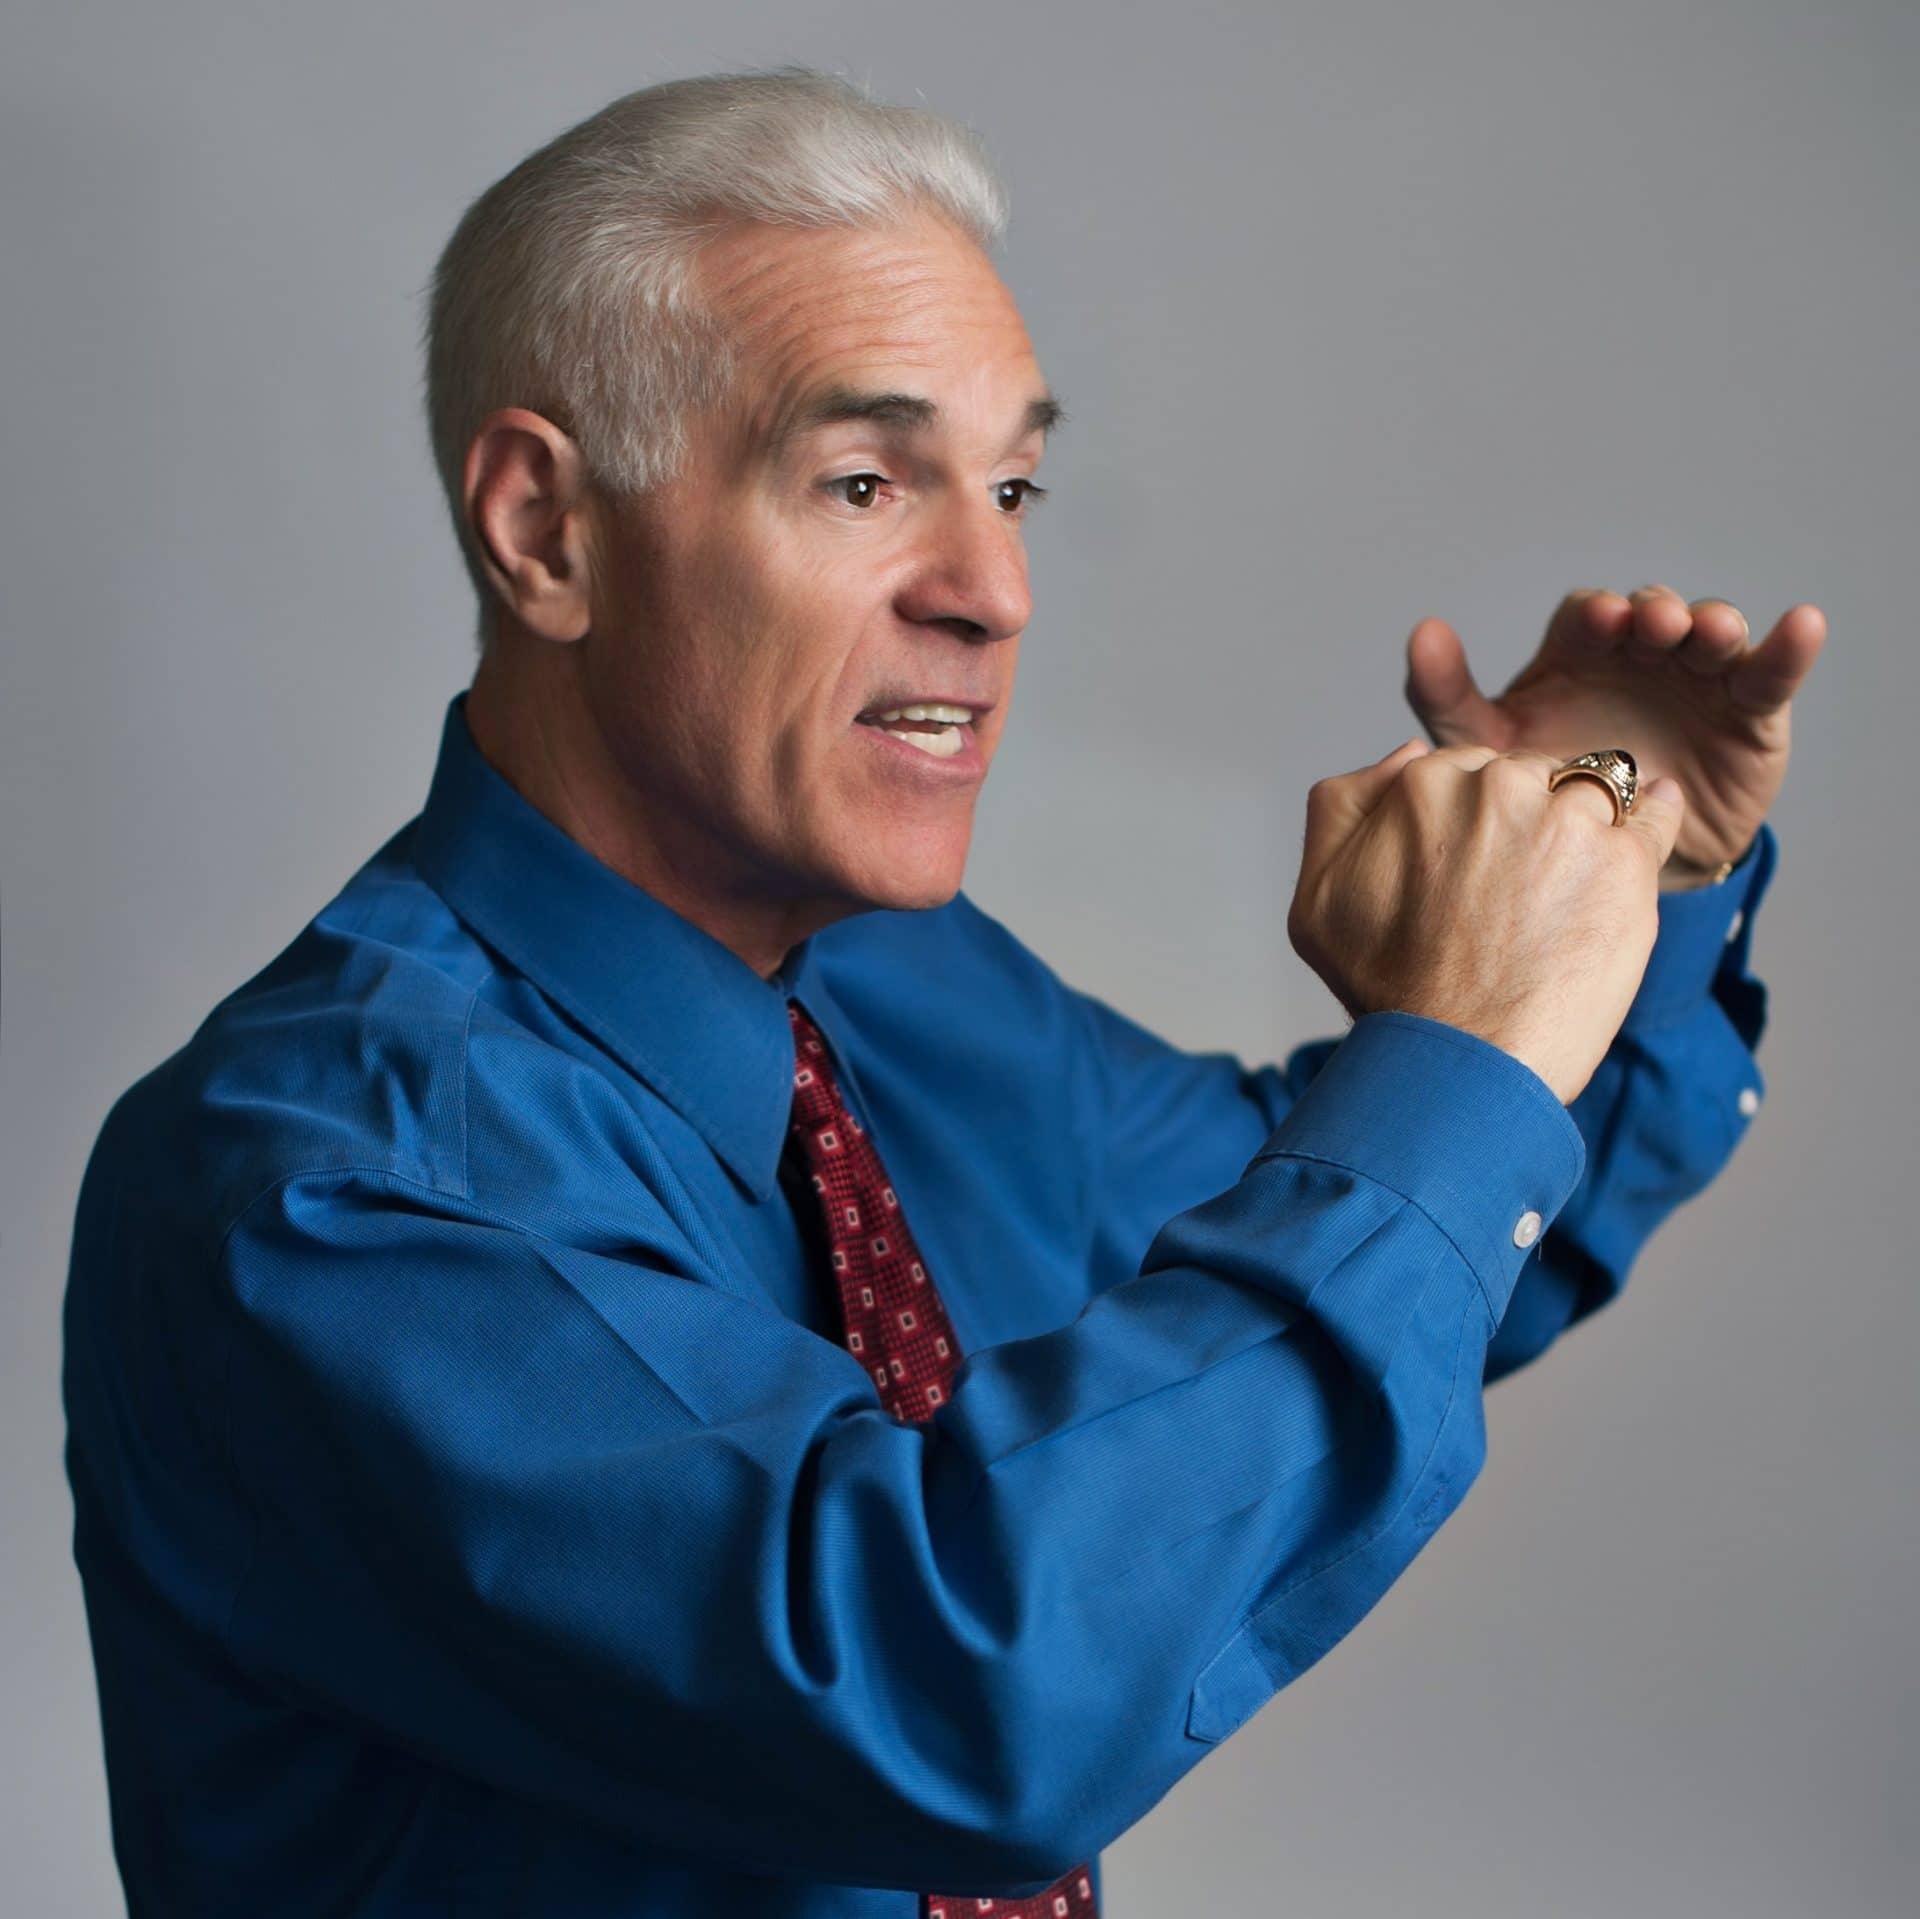 bob-davies-keynote-speaker